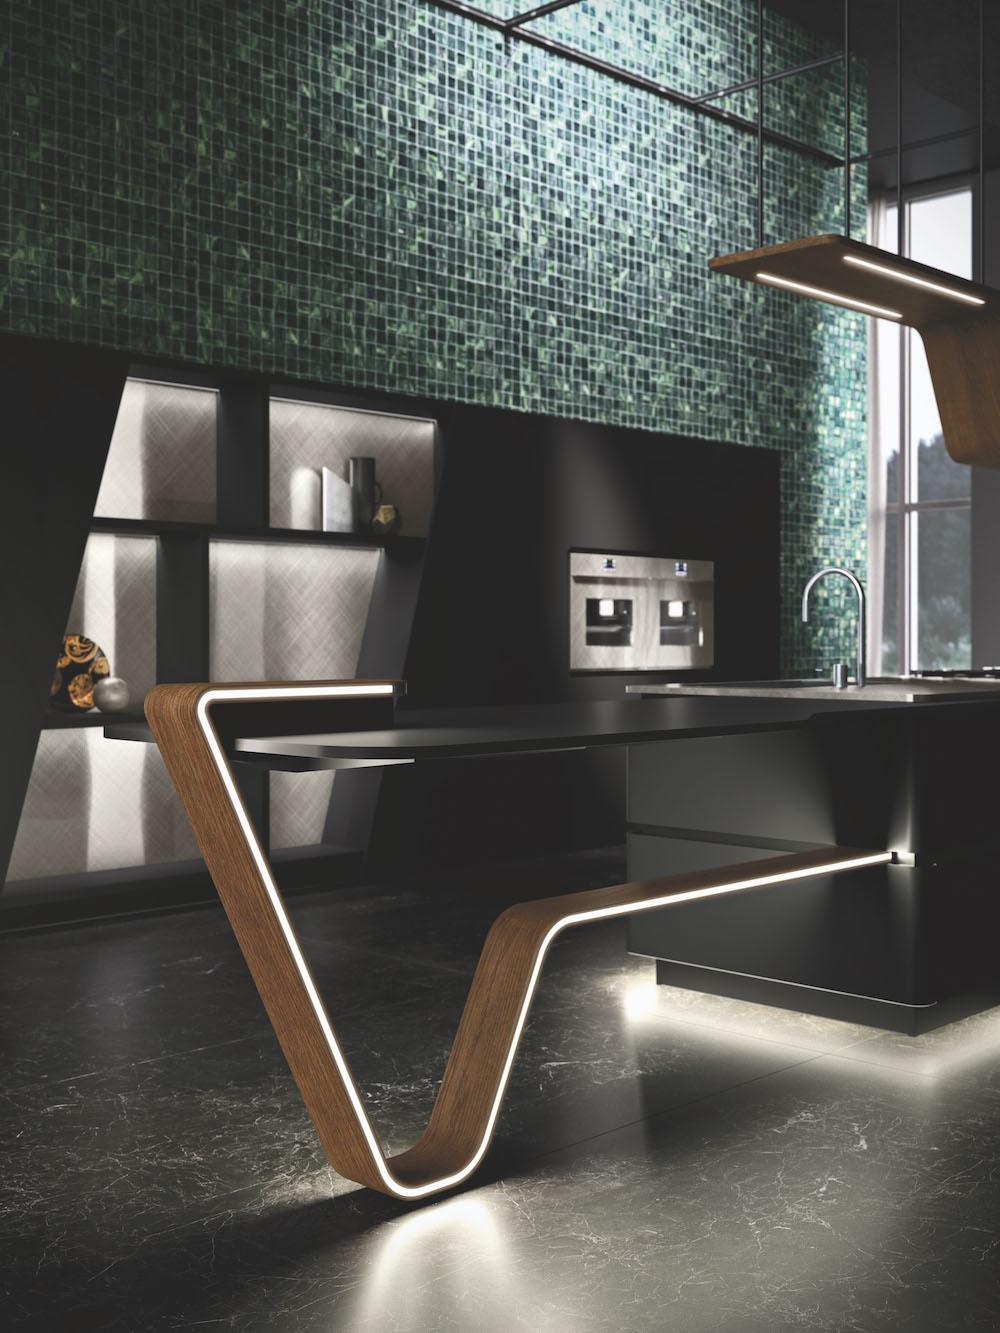 Snaidero Vision keuken nero pur. Zwarte designkeuken met kookeiland #keukendesign #designkeuken #zwartekeuken #snaidero #snaiderovision #madeinitaly #design